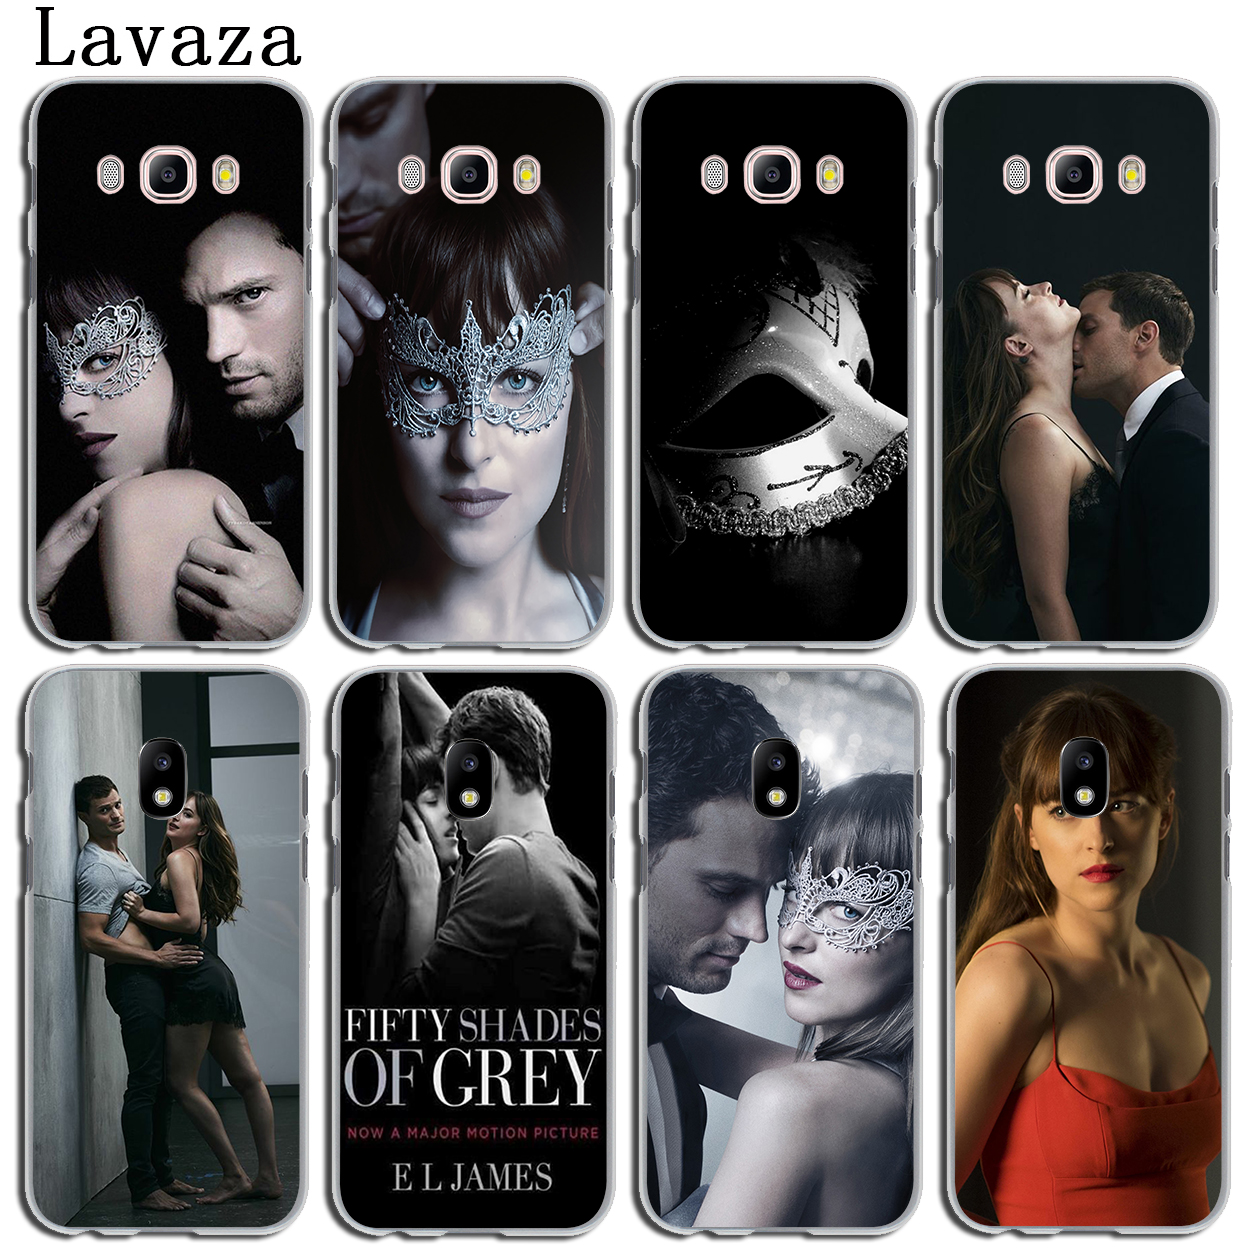 Lavaza Fifty Shades Darker of grey freed Phone Case for Samsung Galaxy J3 J1 J2 J7 J5 2015 2016 2017 J2 Pro Ace J5 J7 Prime Case ...